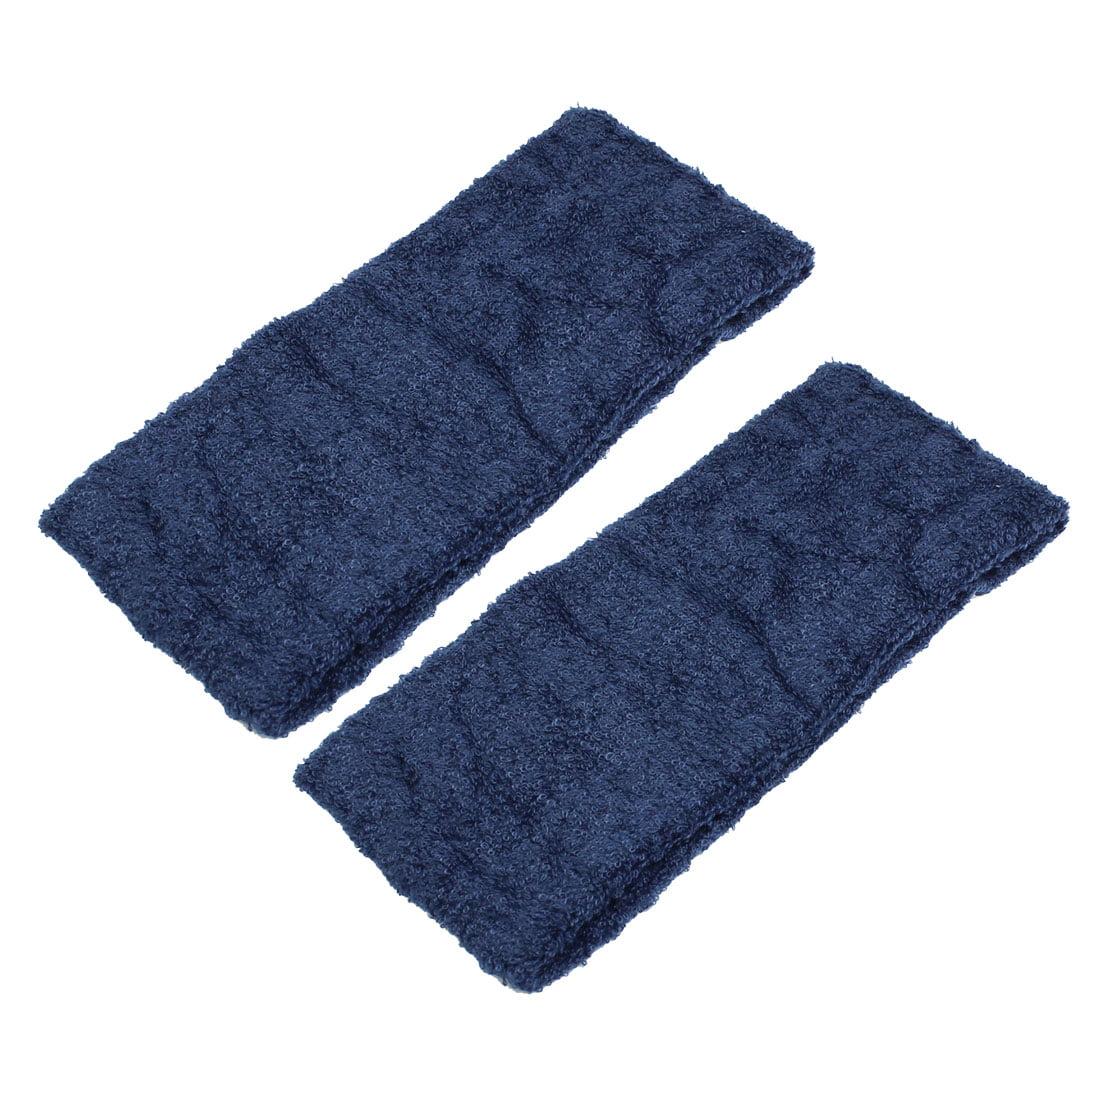 2PCS Athletic Sports Washable Head Band Elastic Headband Hair Holder Dark Blue